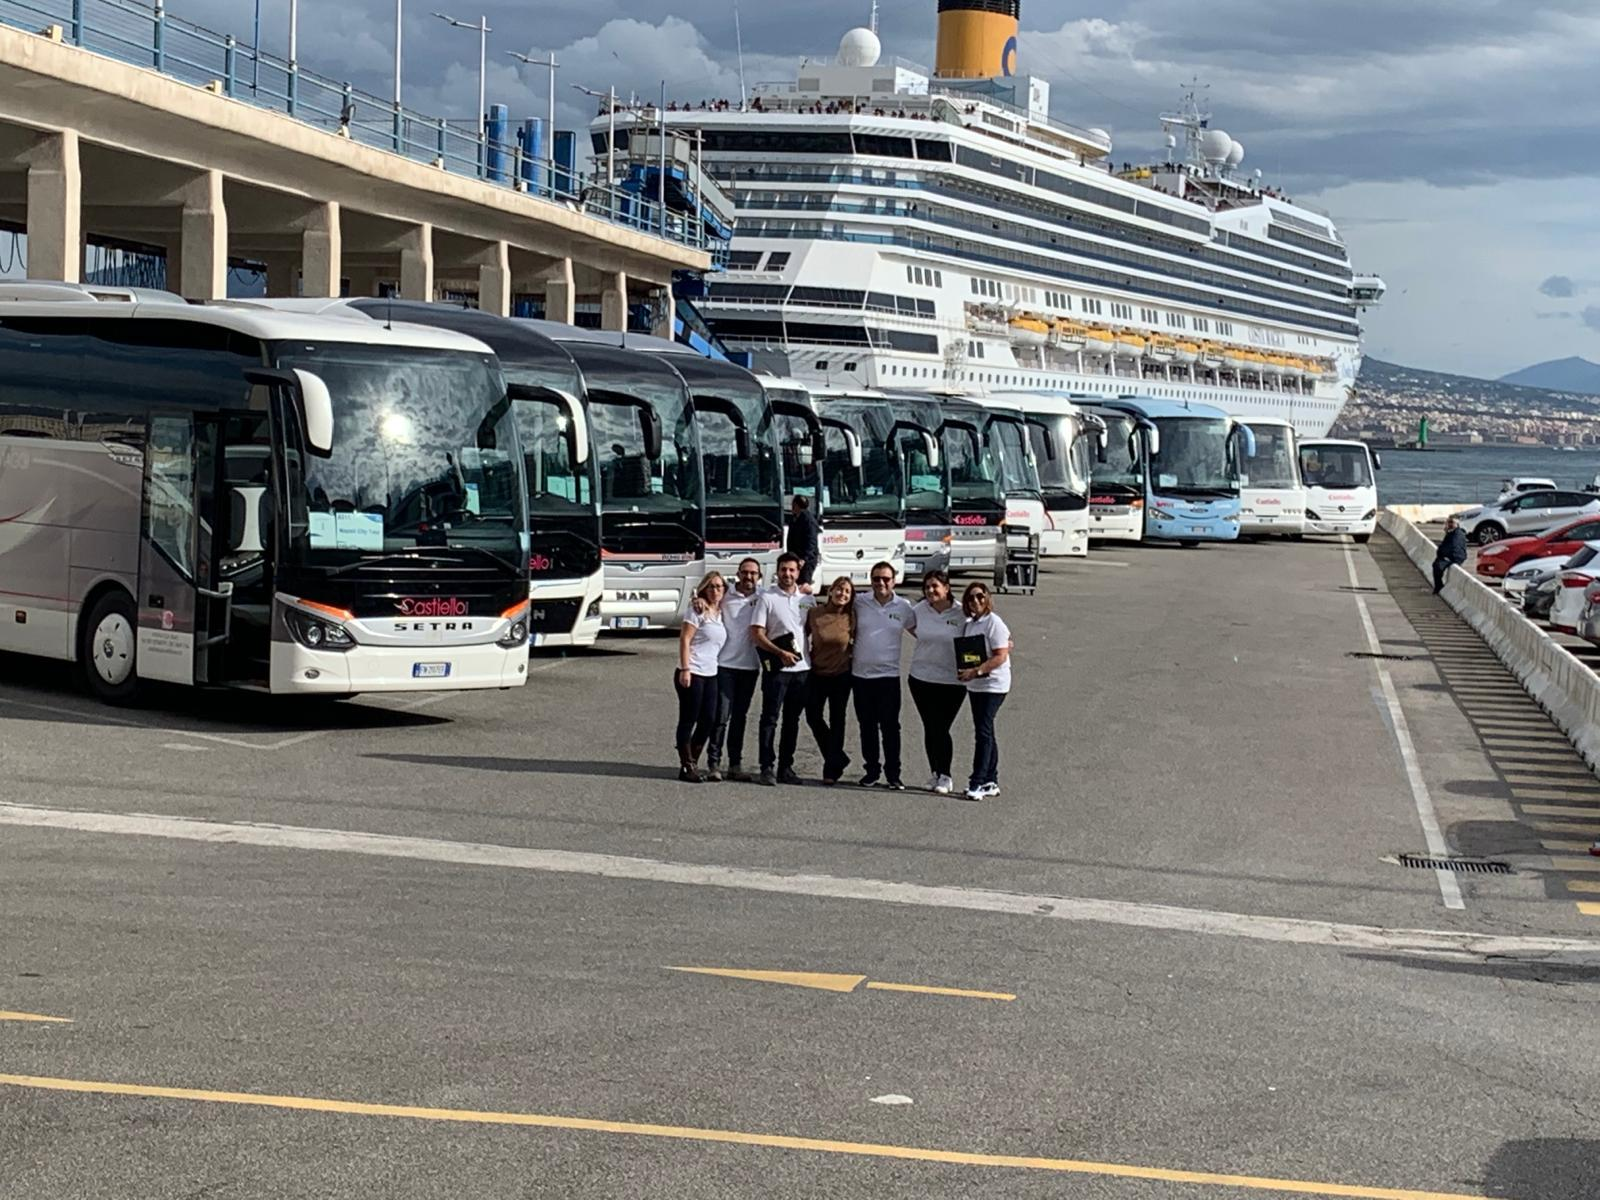 Imprese Di Costruzioni Campania noleggiatori di bus turistici dimenticati dalla regione campania